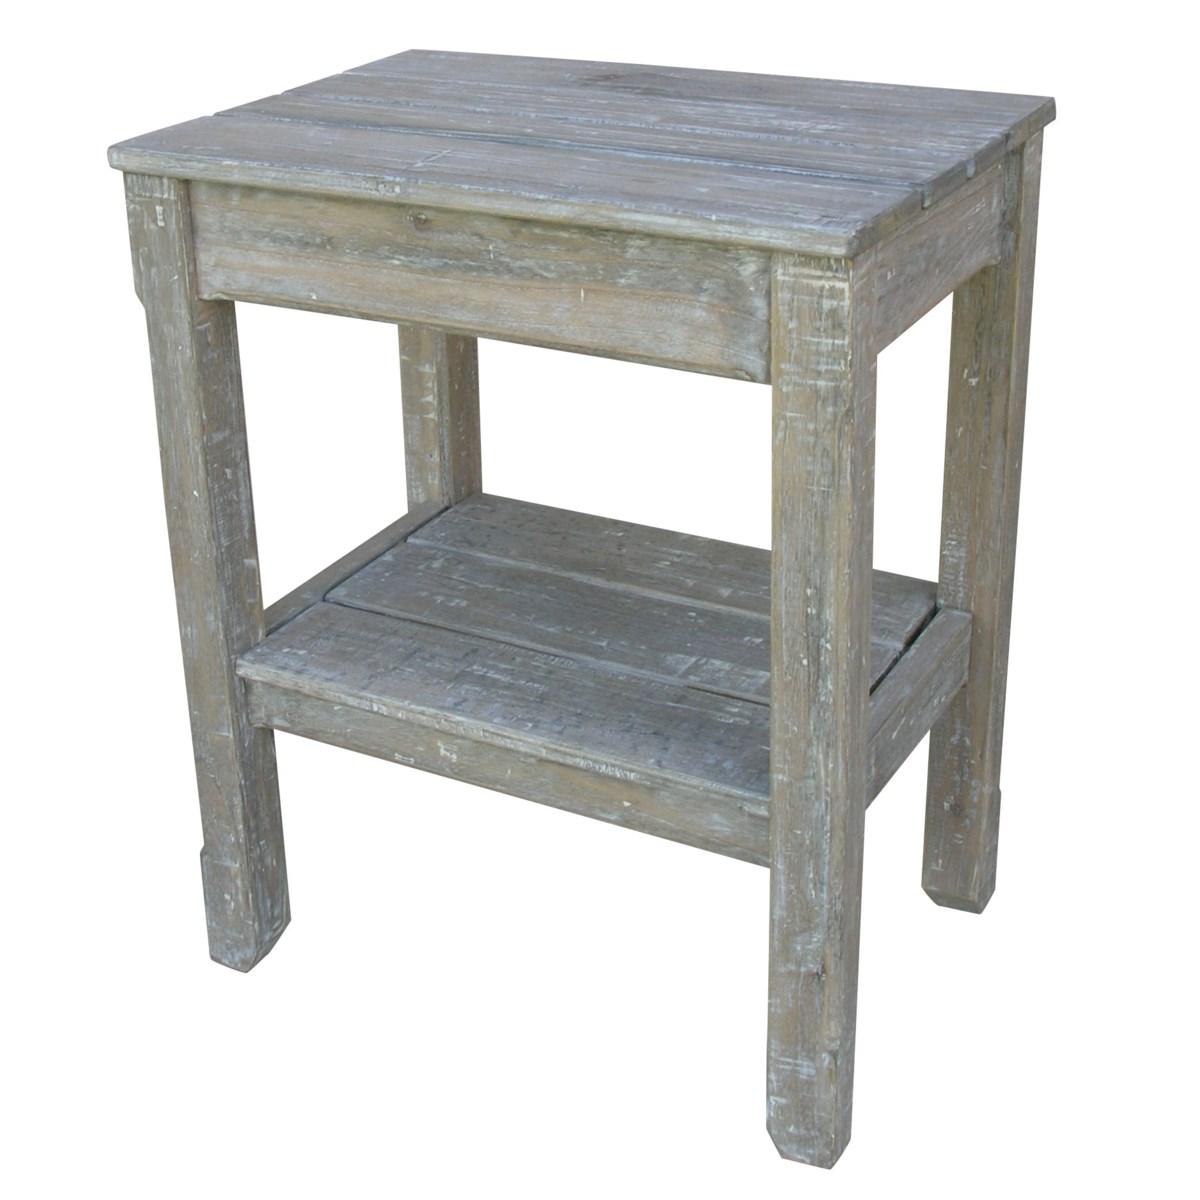 COTTAGE PLNK SIDE TABLE - RW+